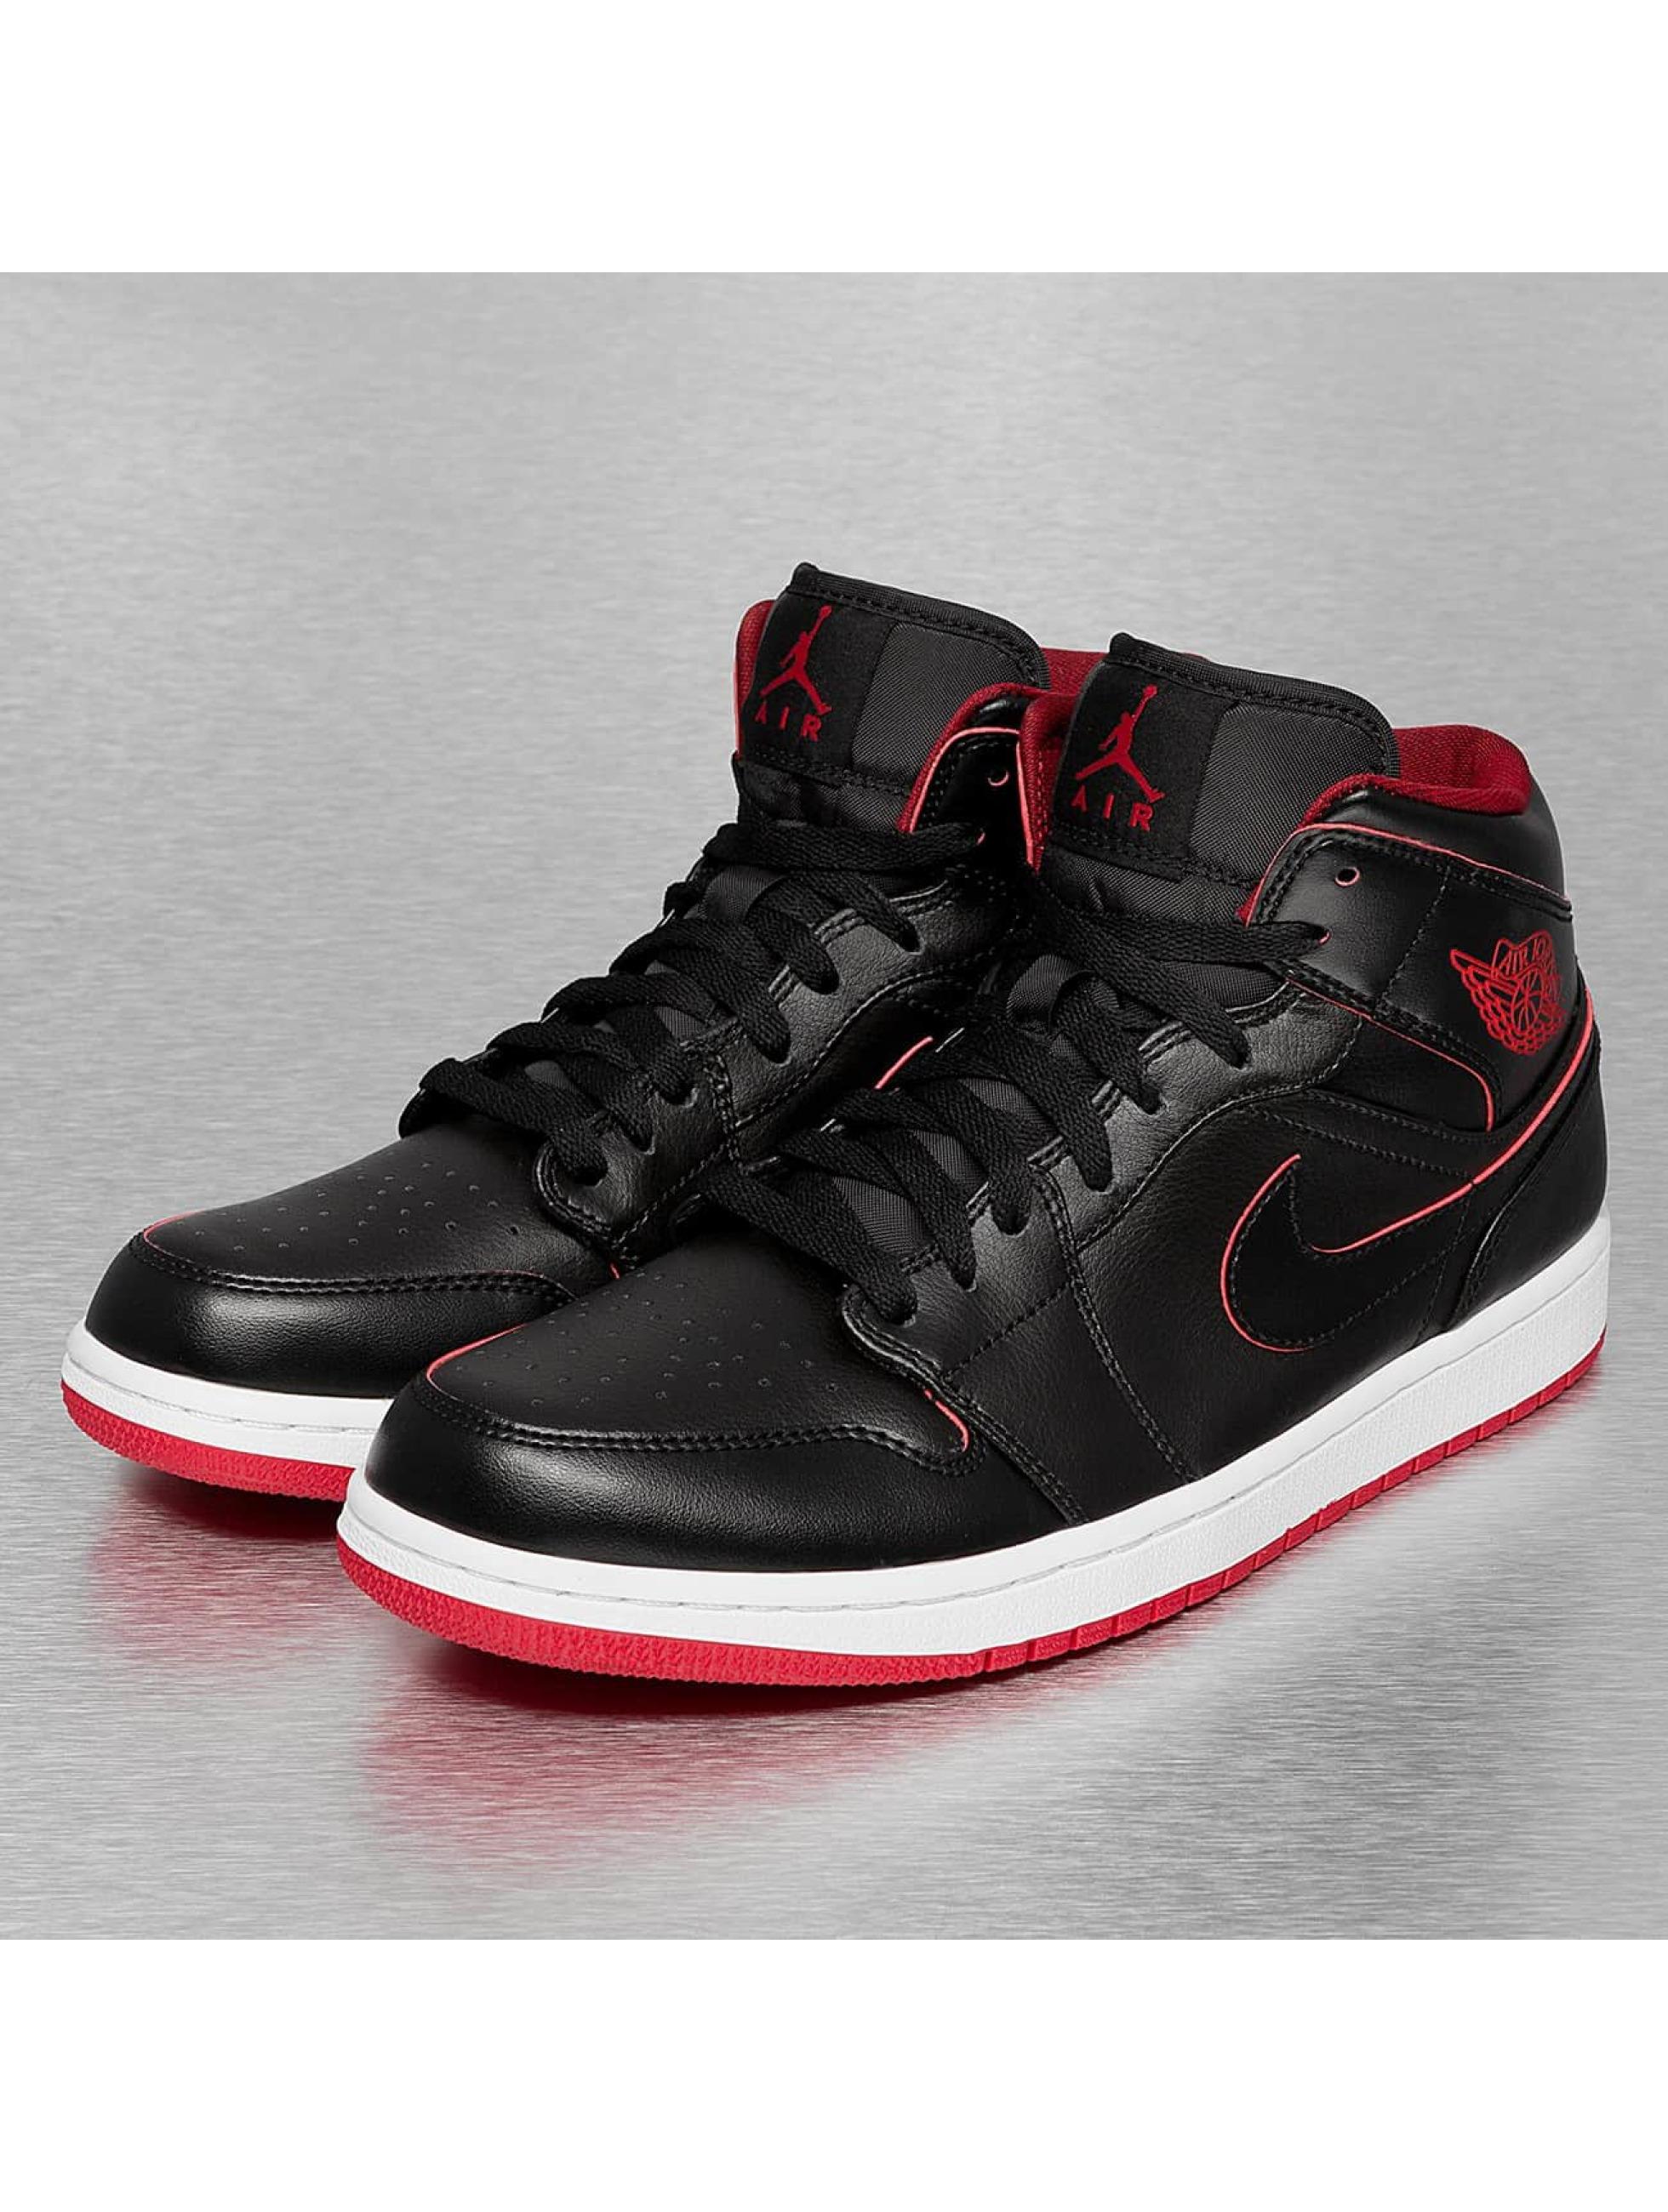 Nike Jordan Schwarz Rot